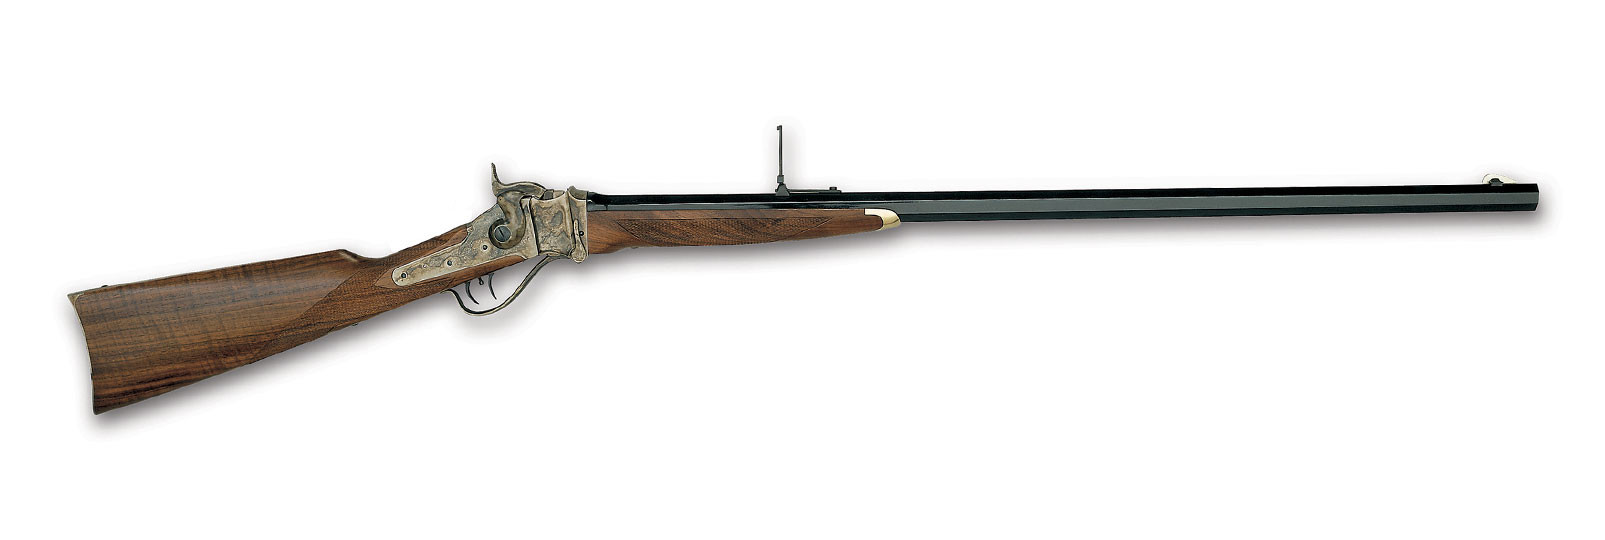 1874 billy's sharps .45-70